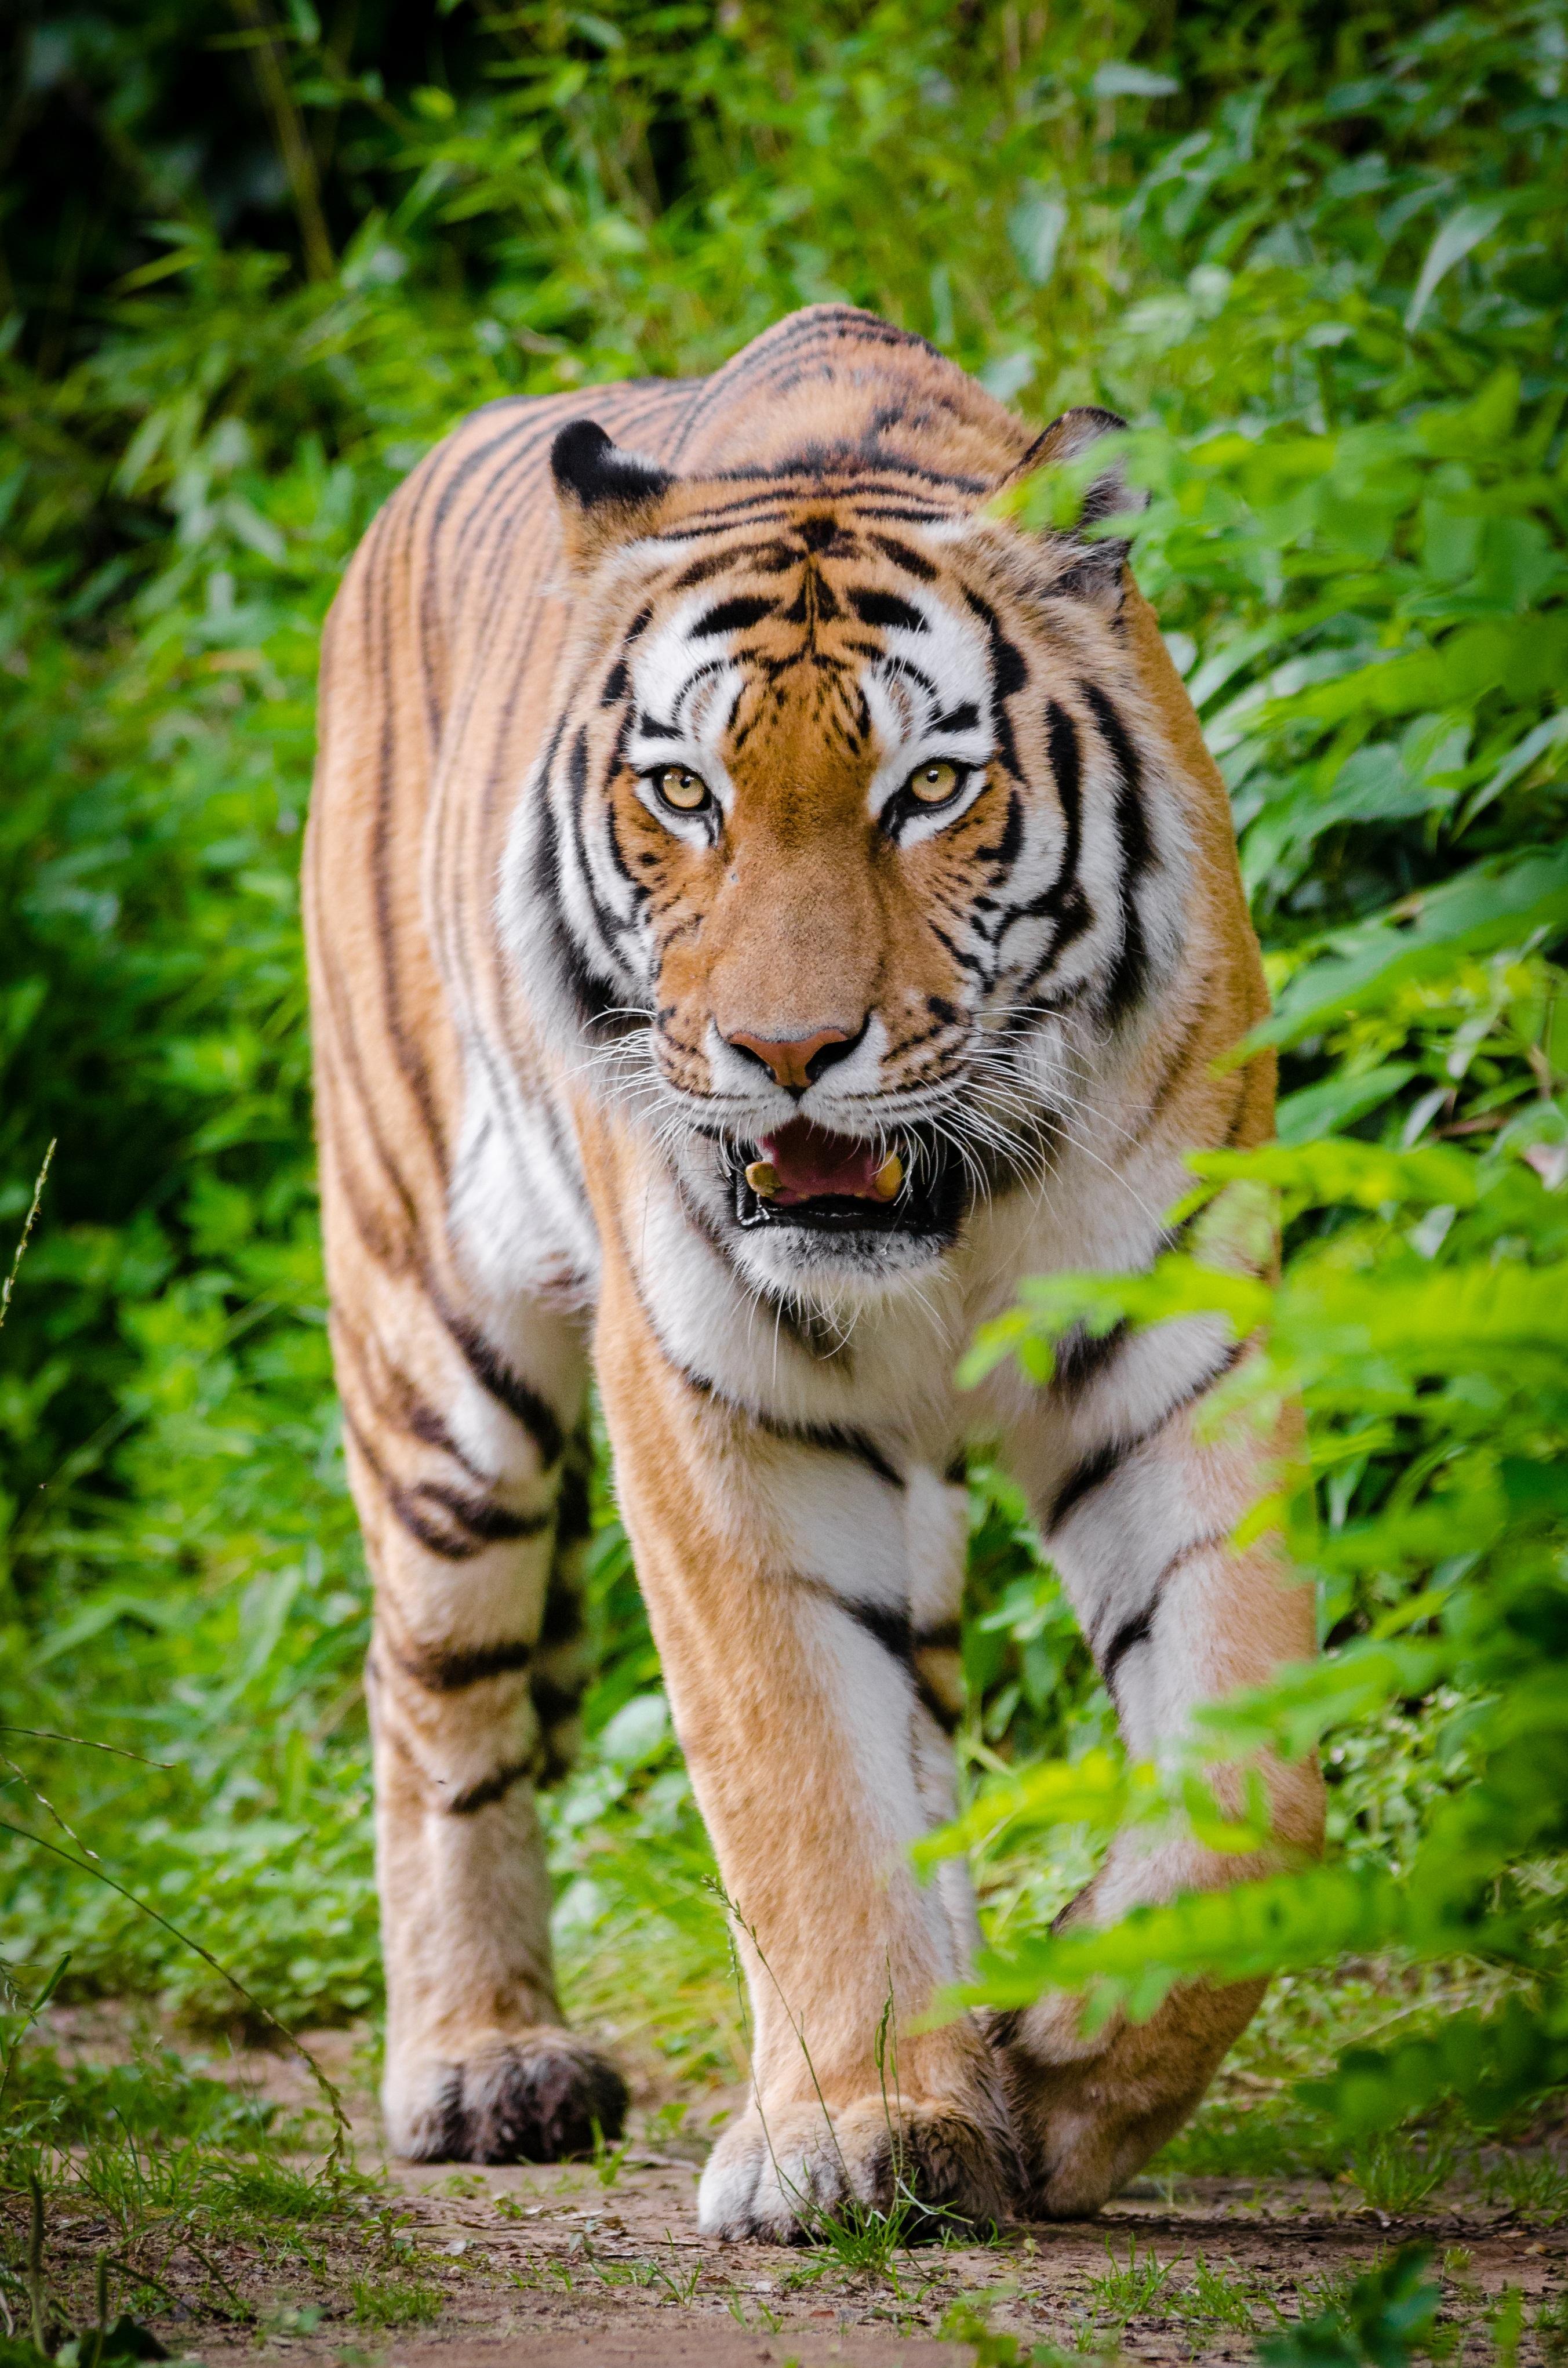 42 Gambar Binatang Flora Dan Fauna HD Terbaru